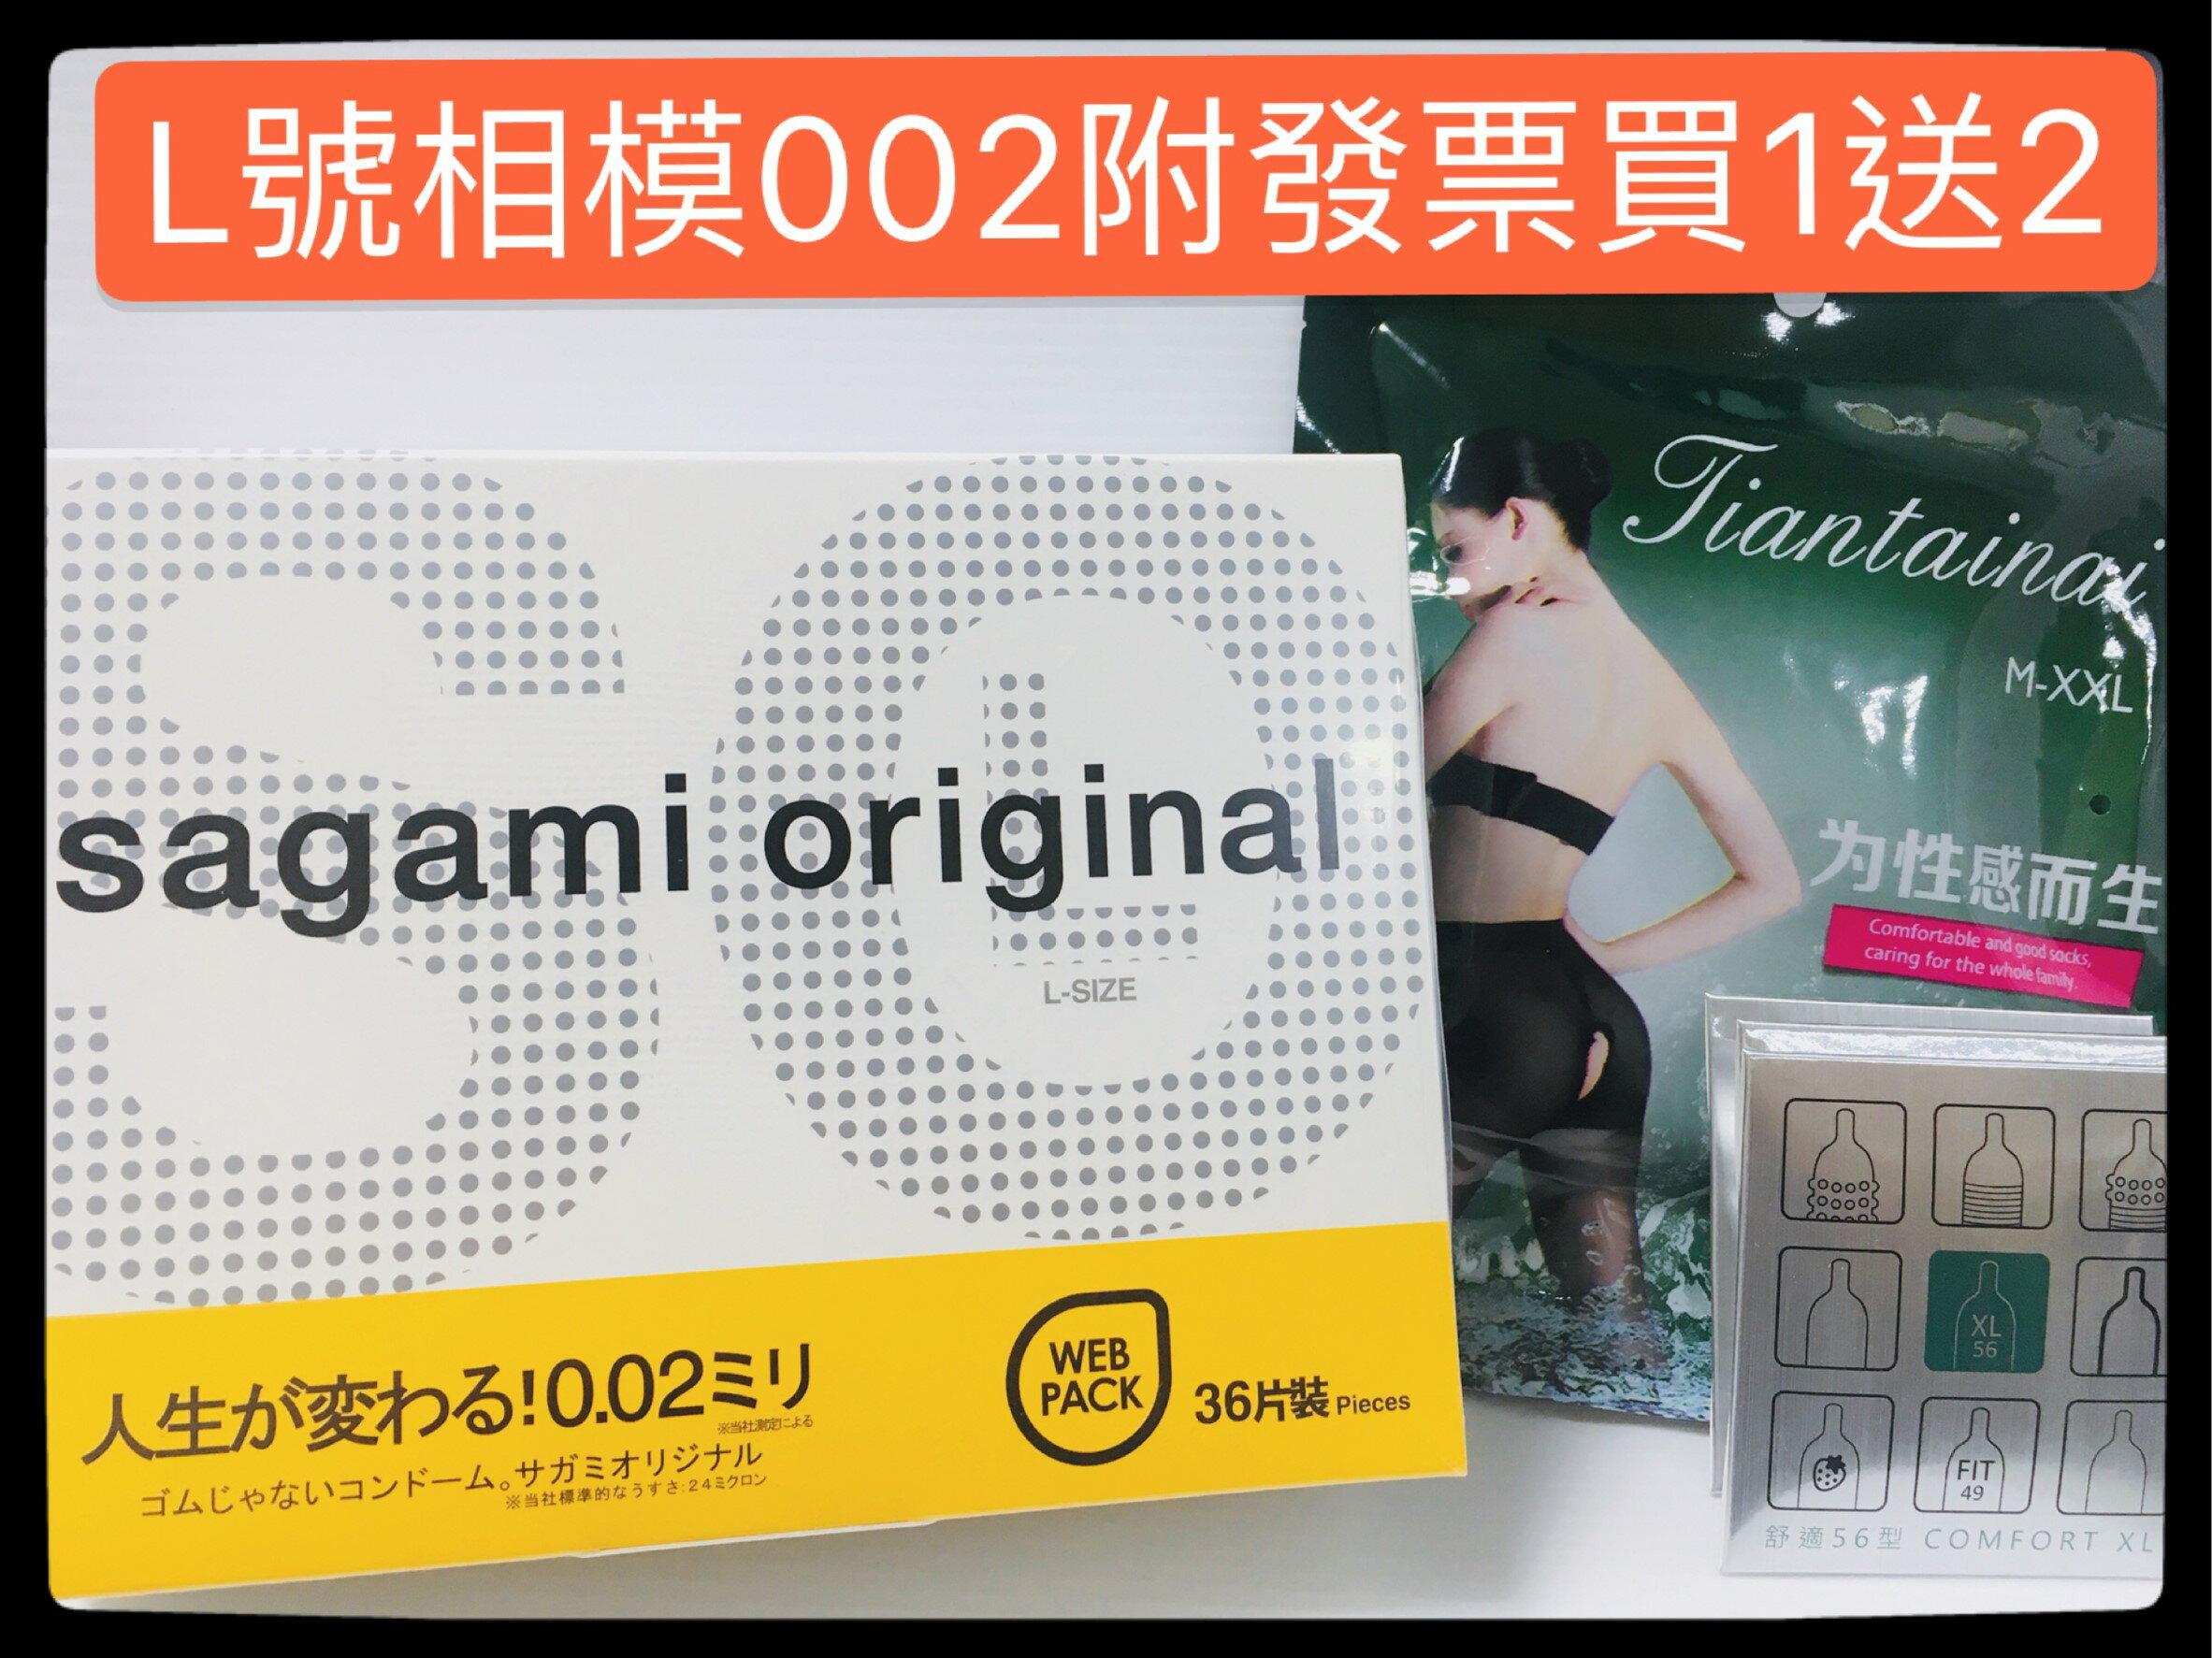 【MG】36入 日本Sagami 相模002 L號元祖超激薄衛生套 保險套 加贈樂趣3入56mm+開檔絲襪